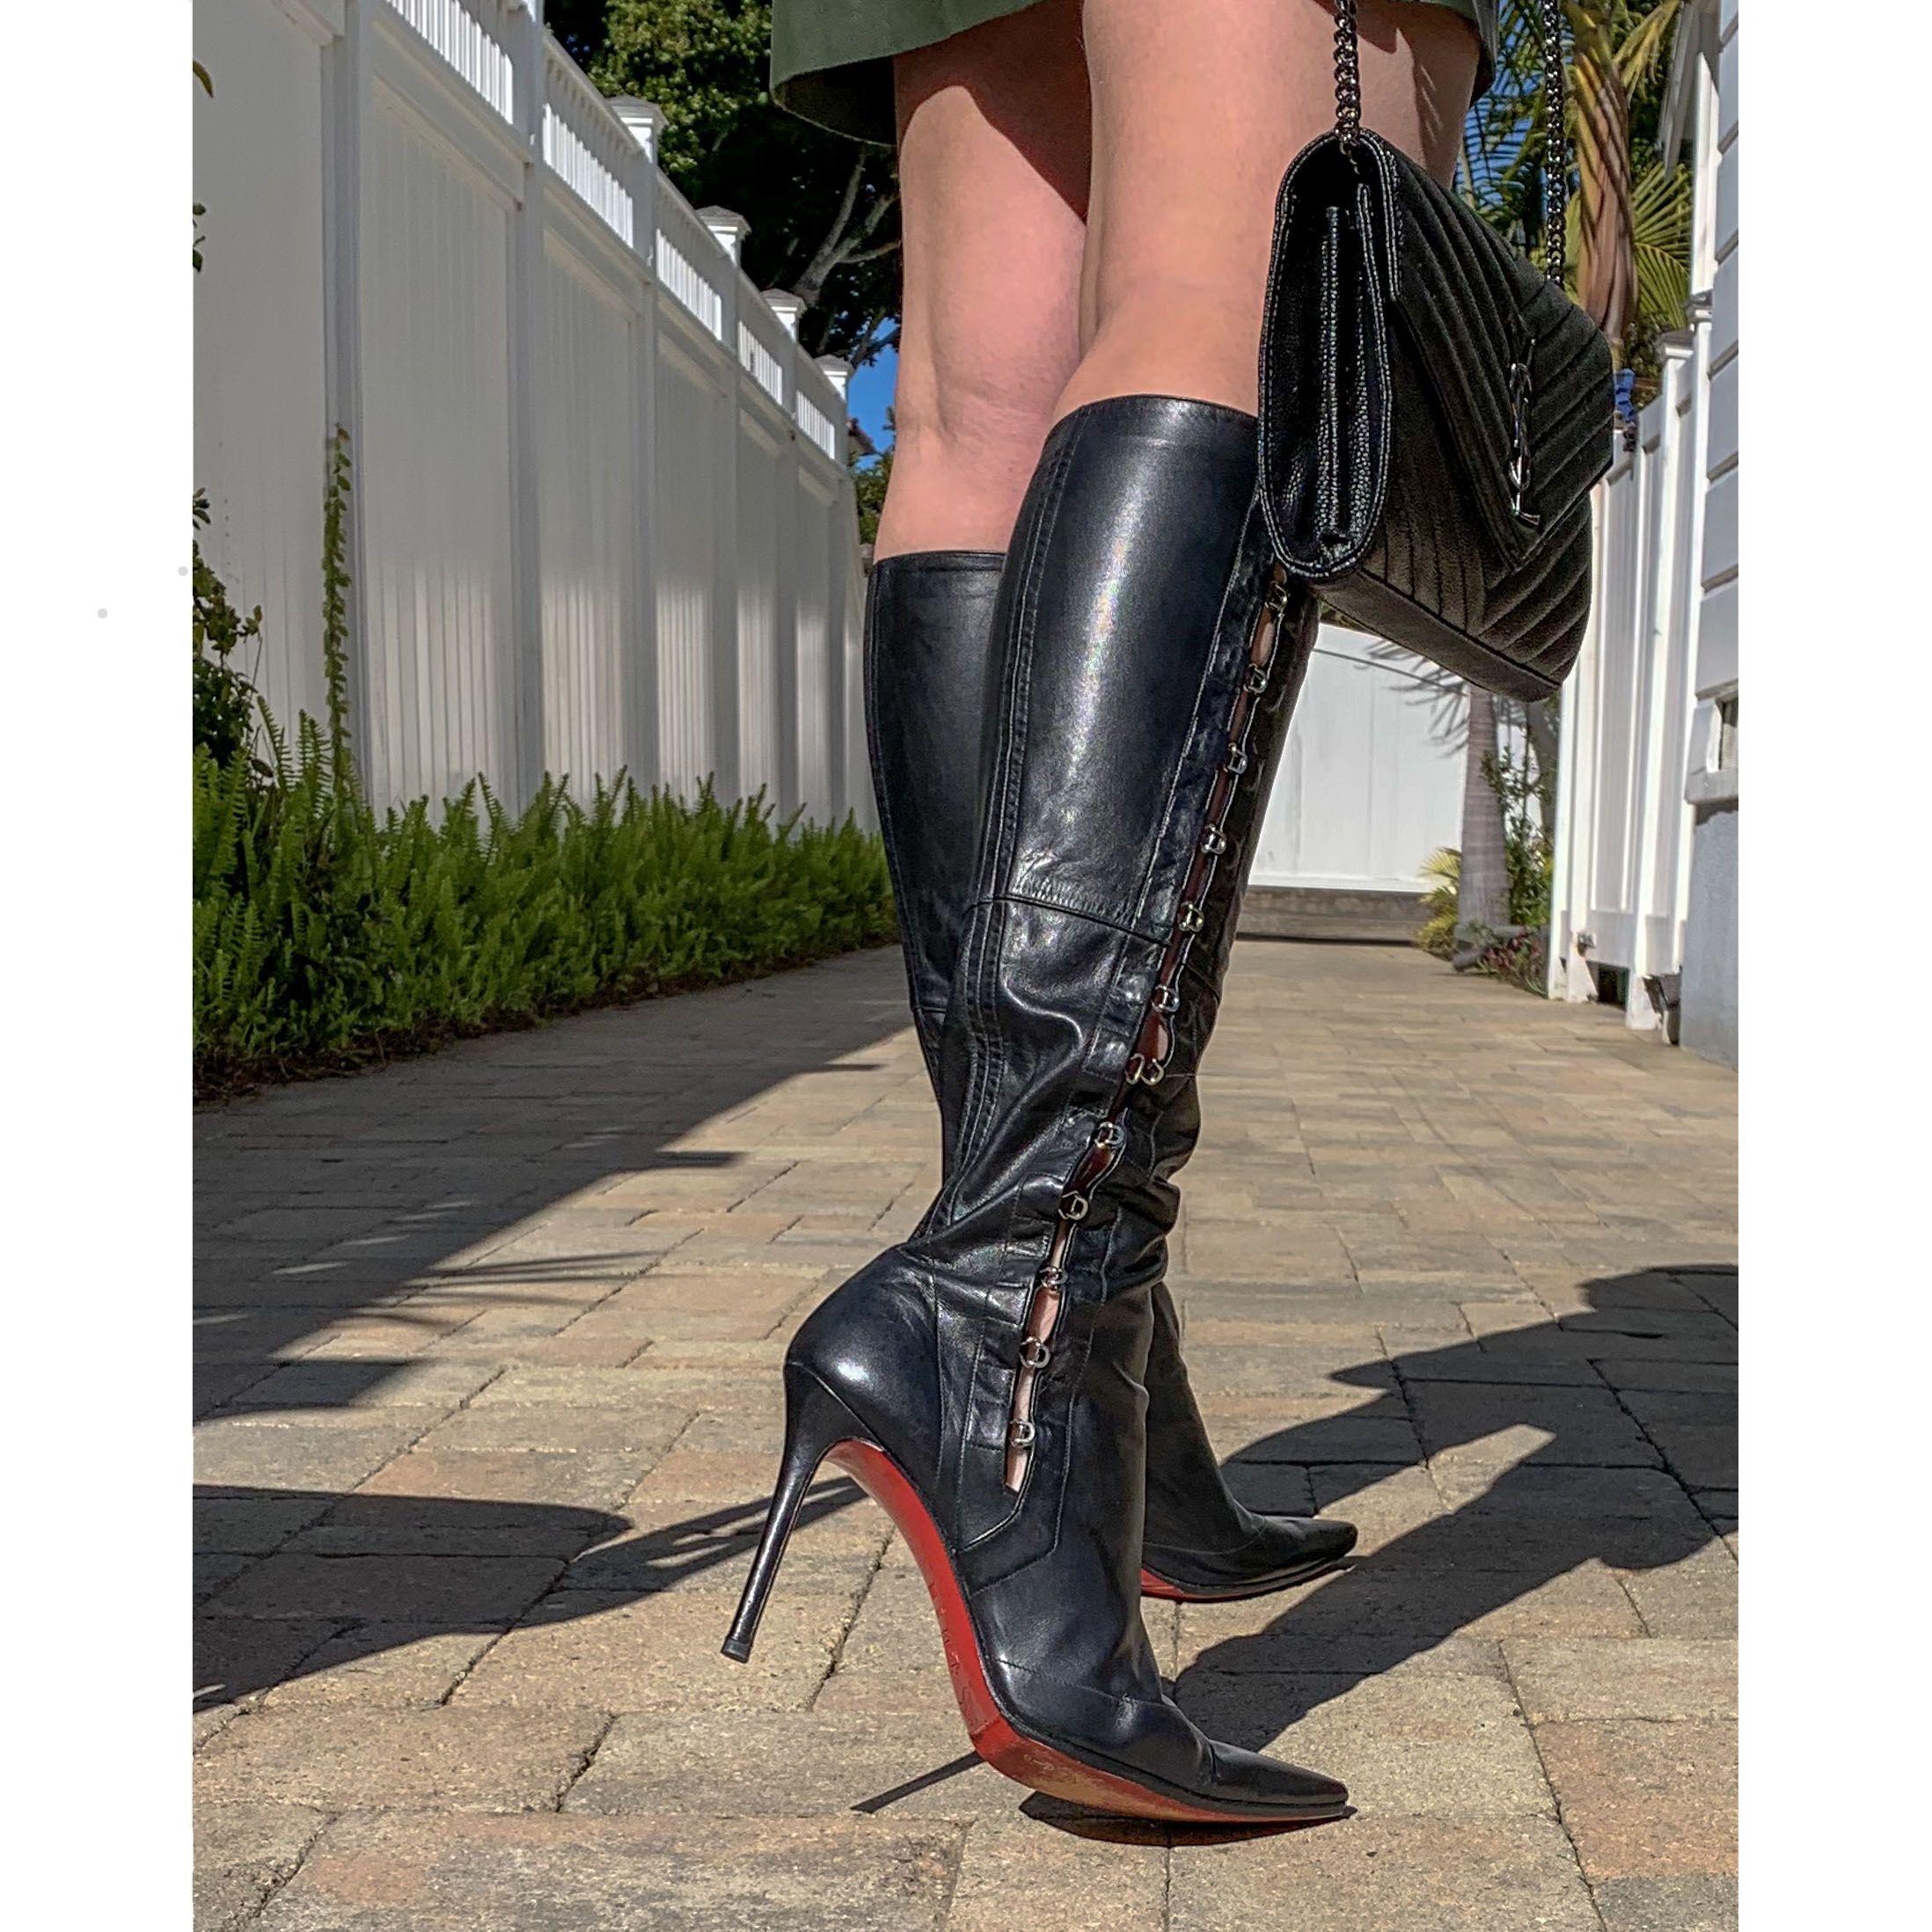 Christian Louboutin 38 5 It 8 5 Us Black Leather Boots Tall Womens Tall Black Leather Boots Black Boots Tall [ 2196 x 2196 Pixel ]